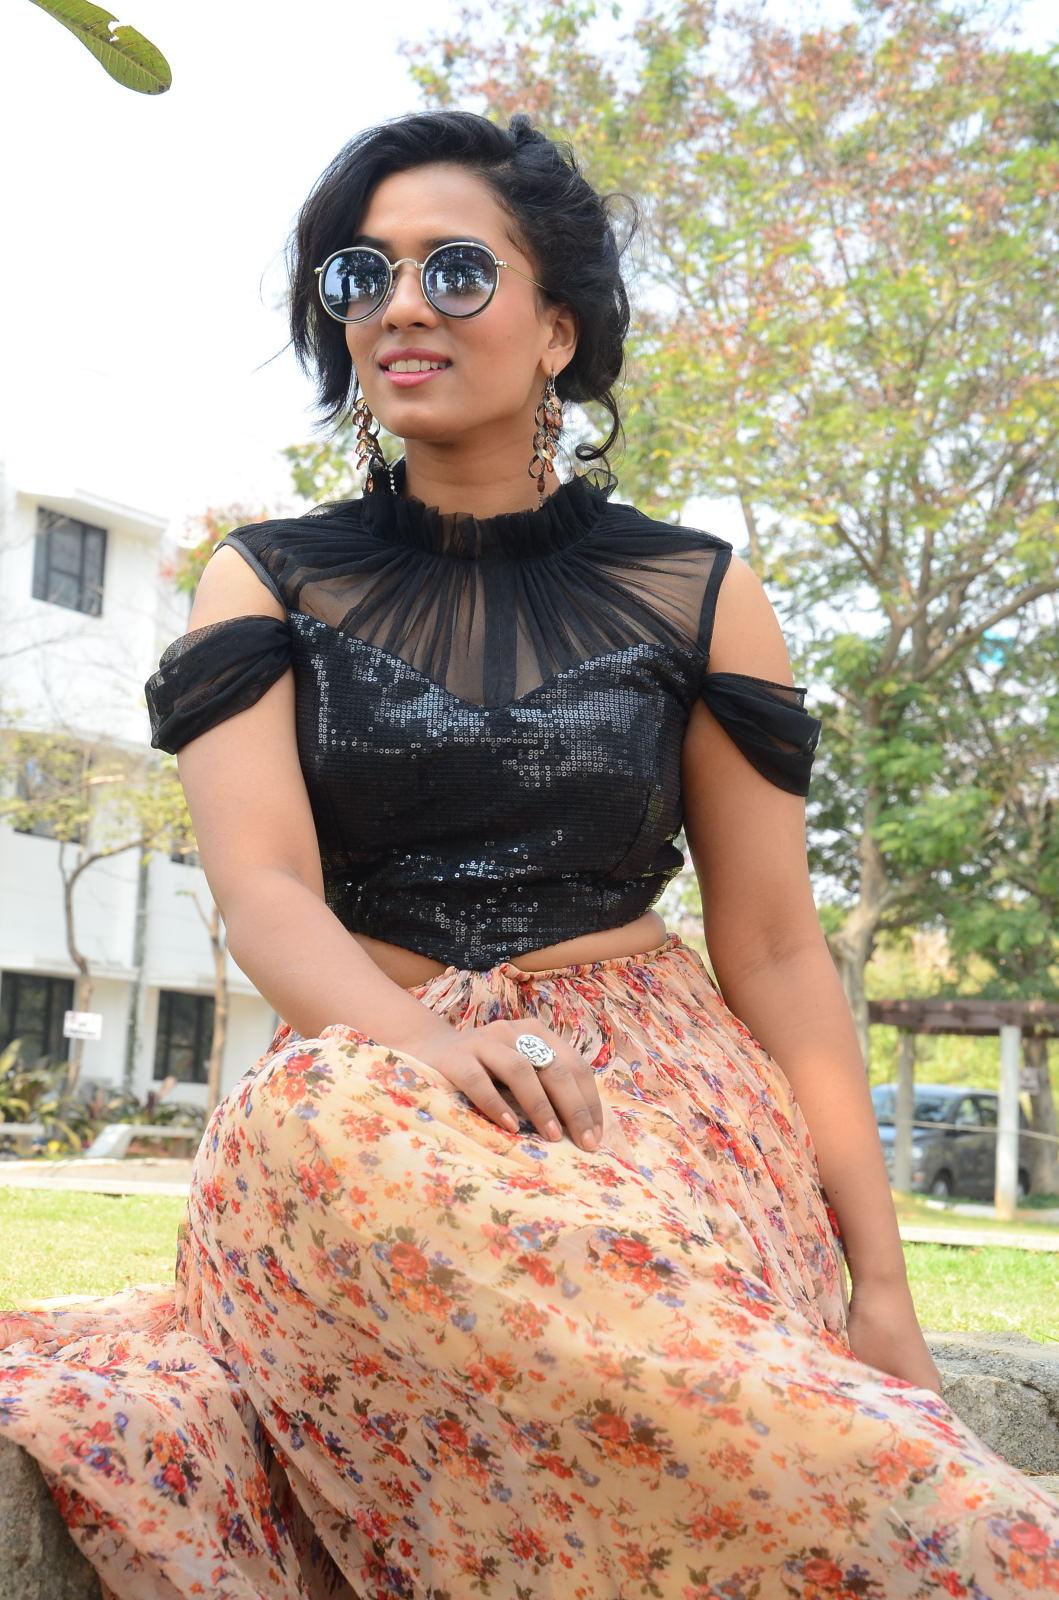 chetana uttej Brand New Photo Stills Of South Actress Chetana Uttej | Tollywood Chetana Uttej 136